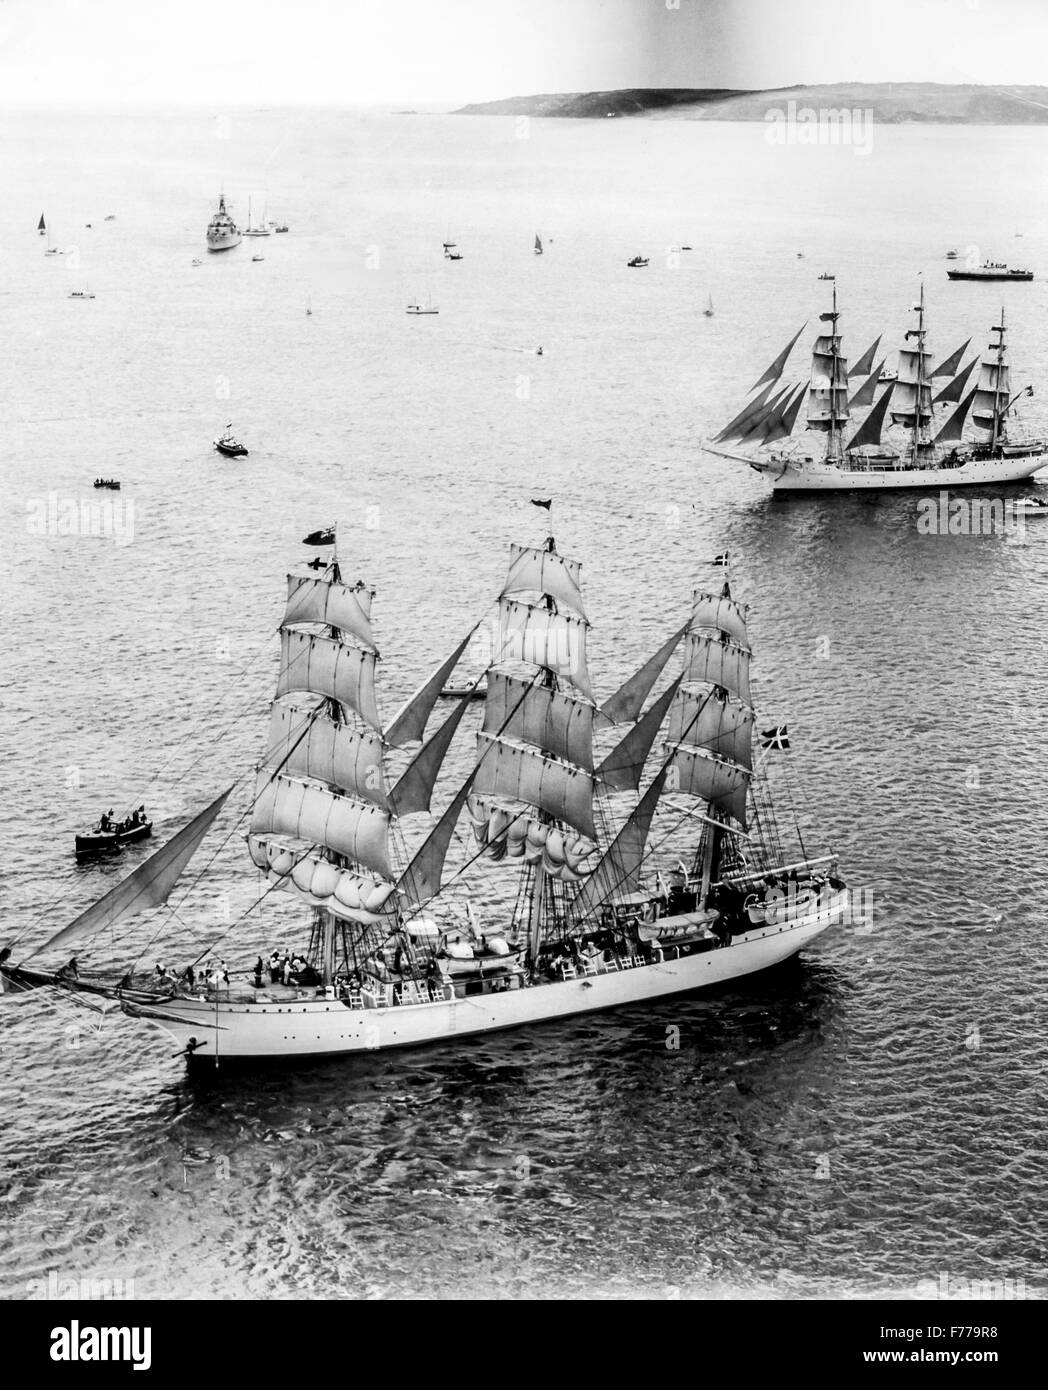 the danmark ship Danish and Norwegian Christian Radich,Falmouth tall ships regatta,England 1966 - Stock Image